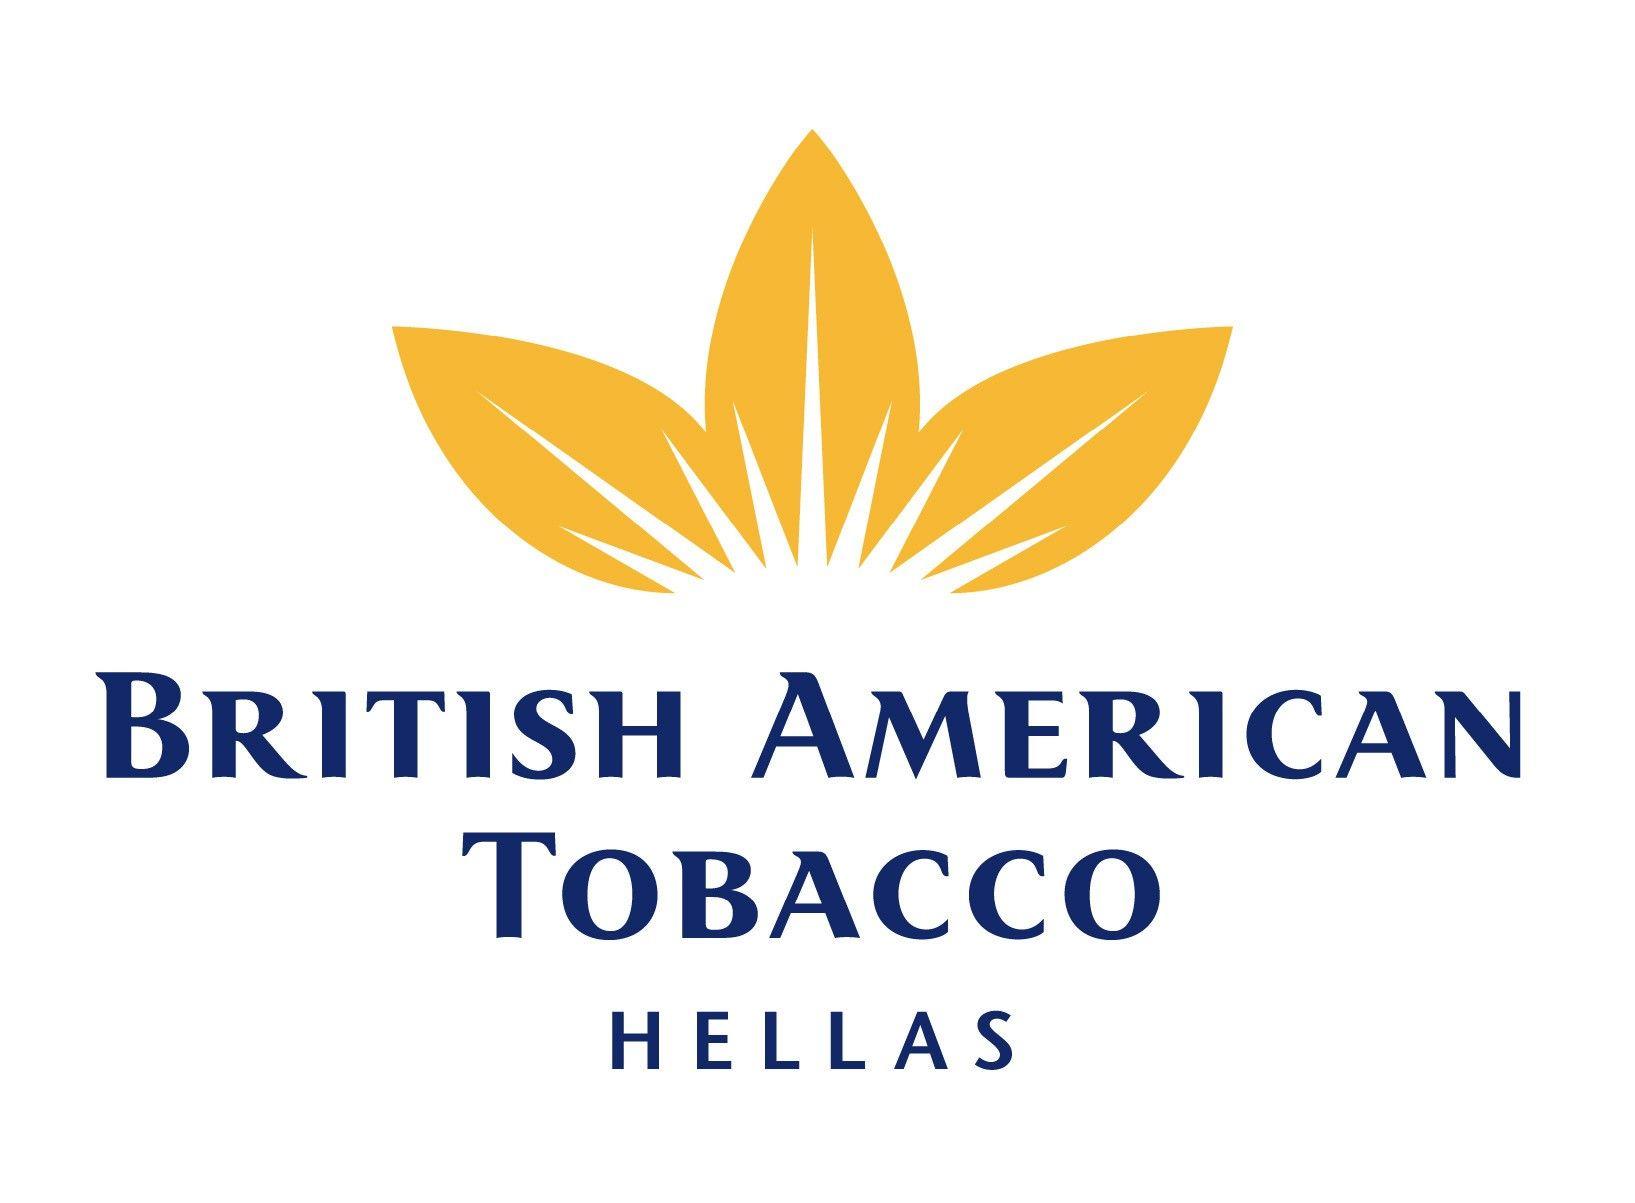 British American Tobacco Hellas: Παράδοση τριών ανακαινισμένων λεωφορείων στην ΟΣΥ